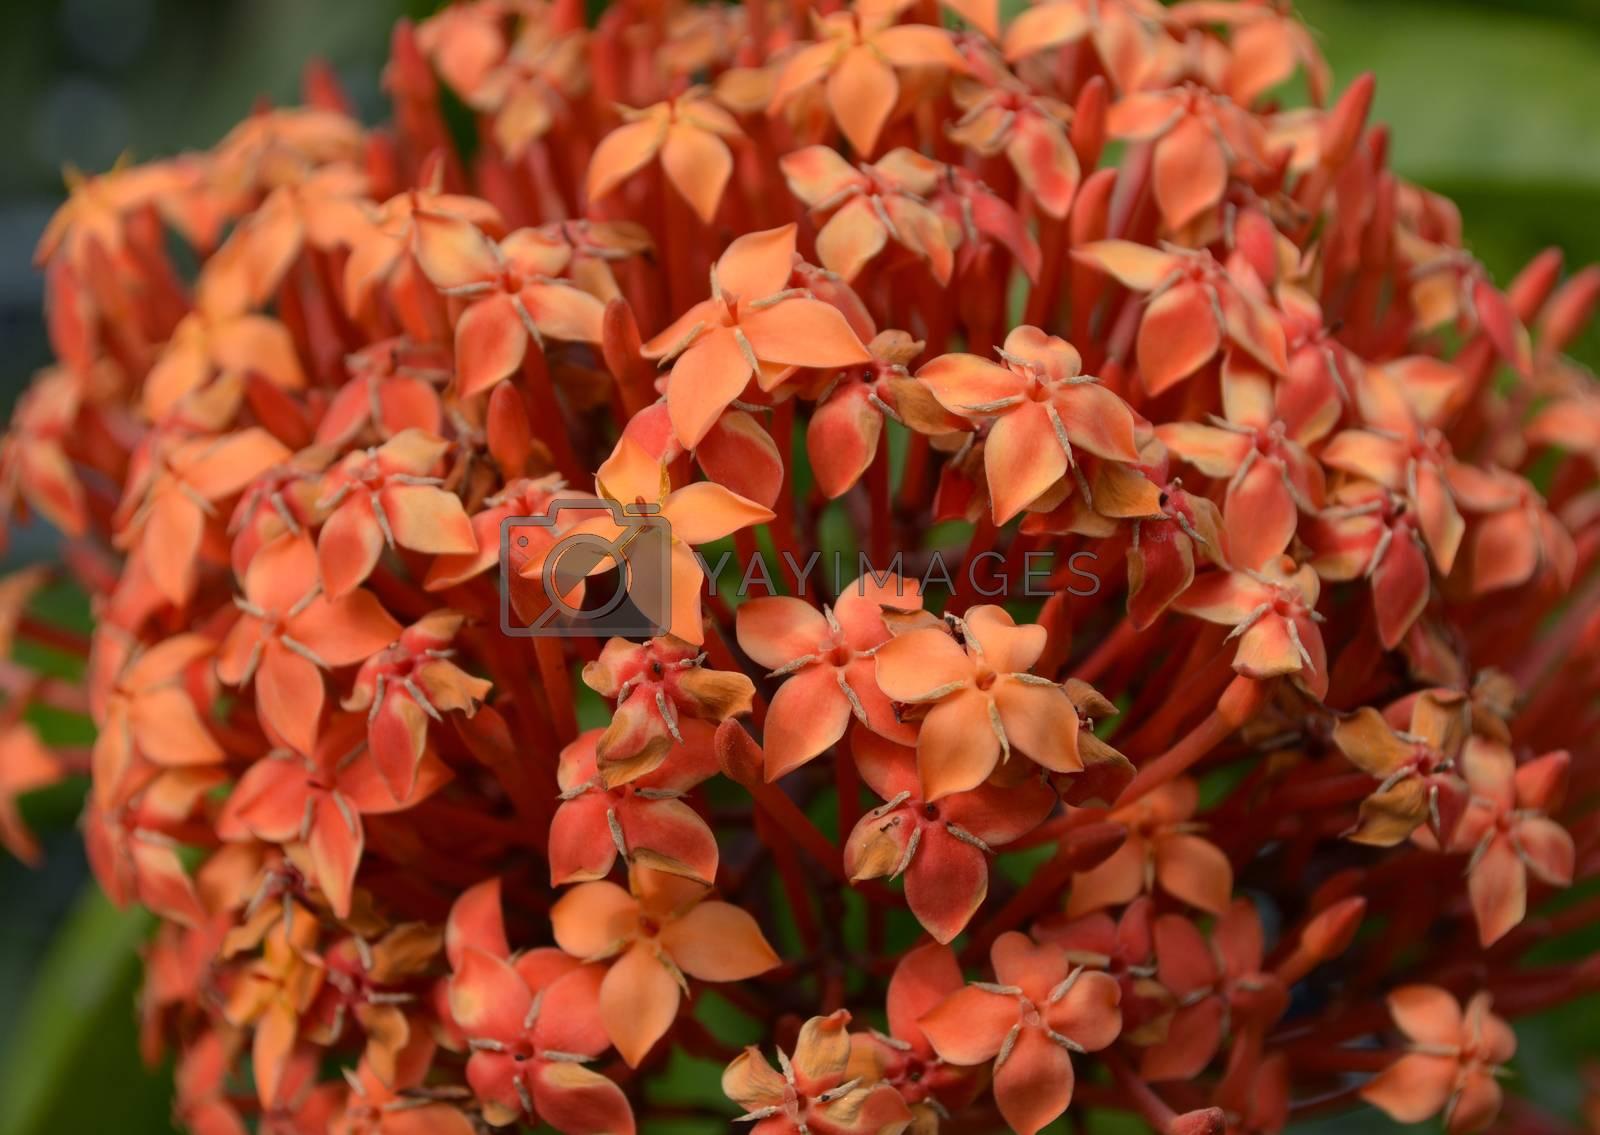 Flowers in the garden captured very closeup